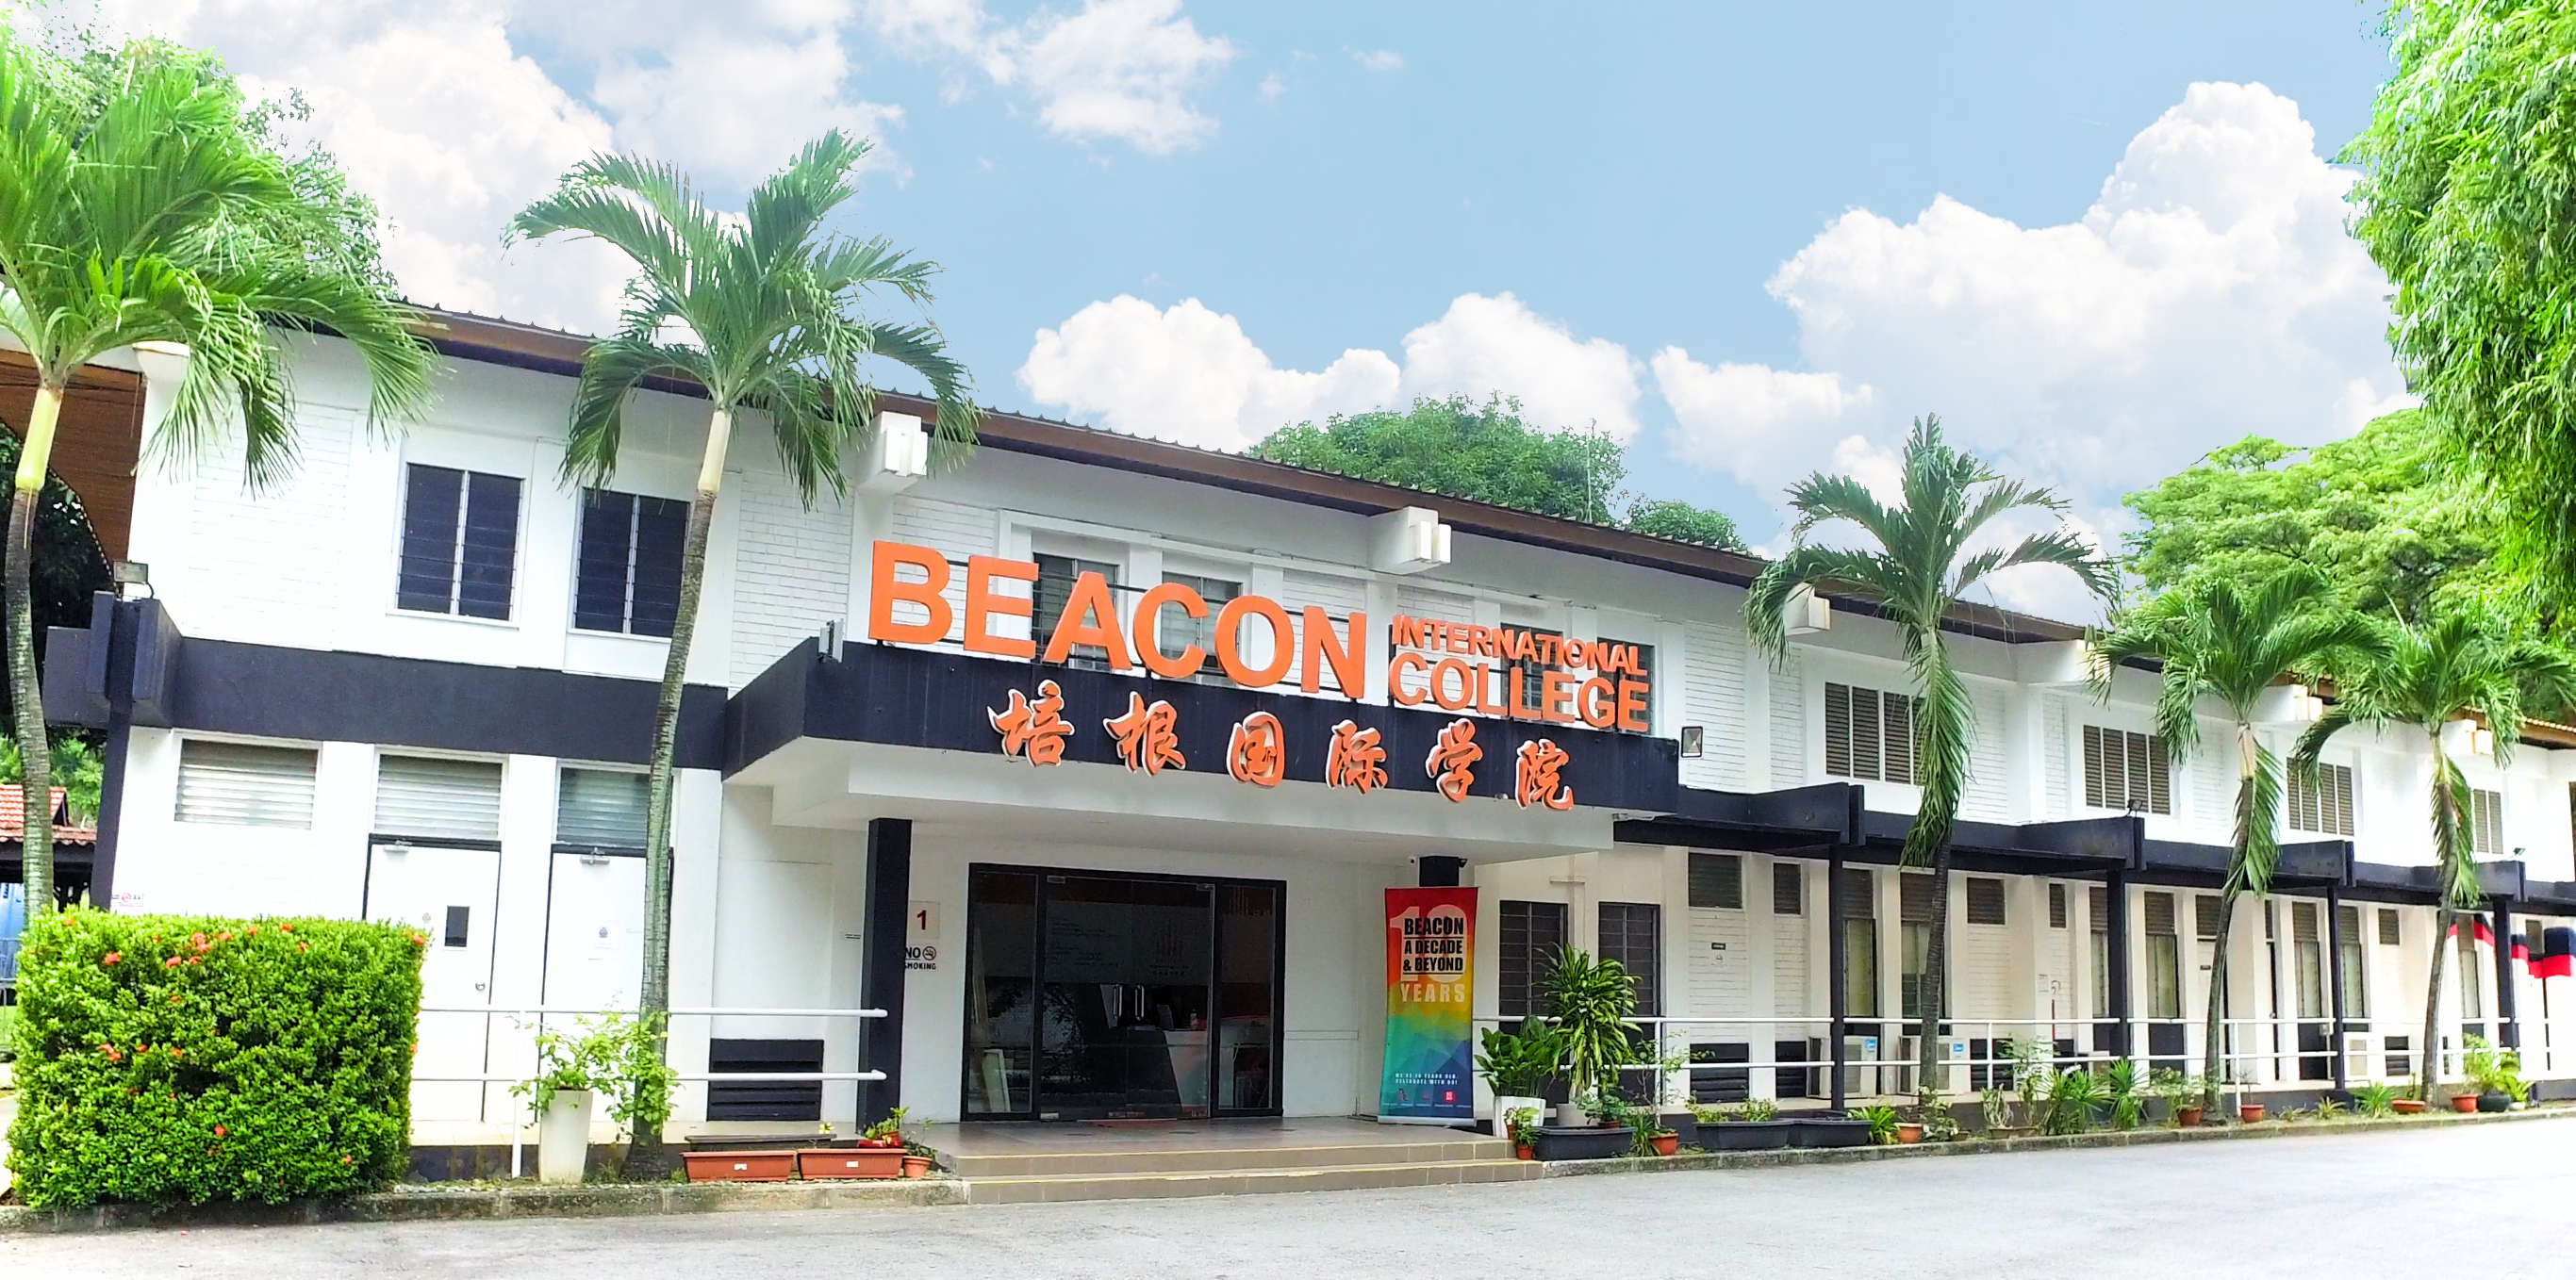 Beacon Equity Trust Scholarships For Undergraduates At Beacon Partner University in UK 2019